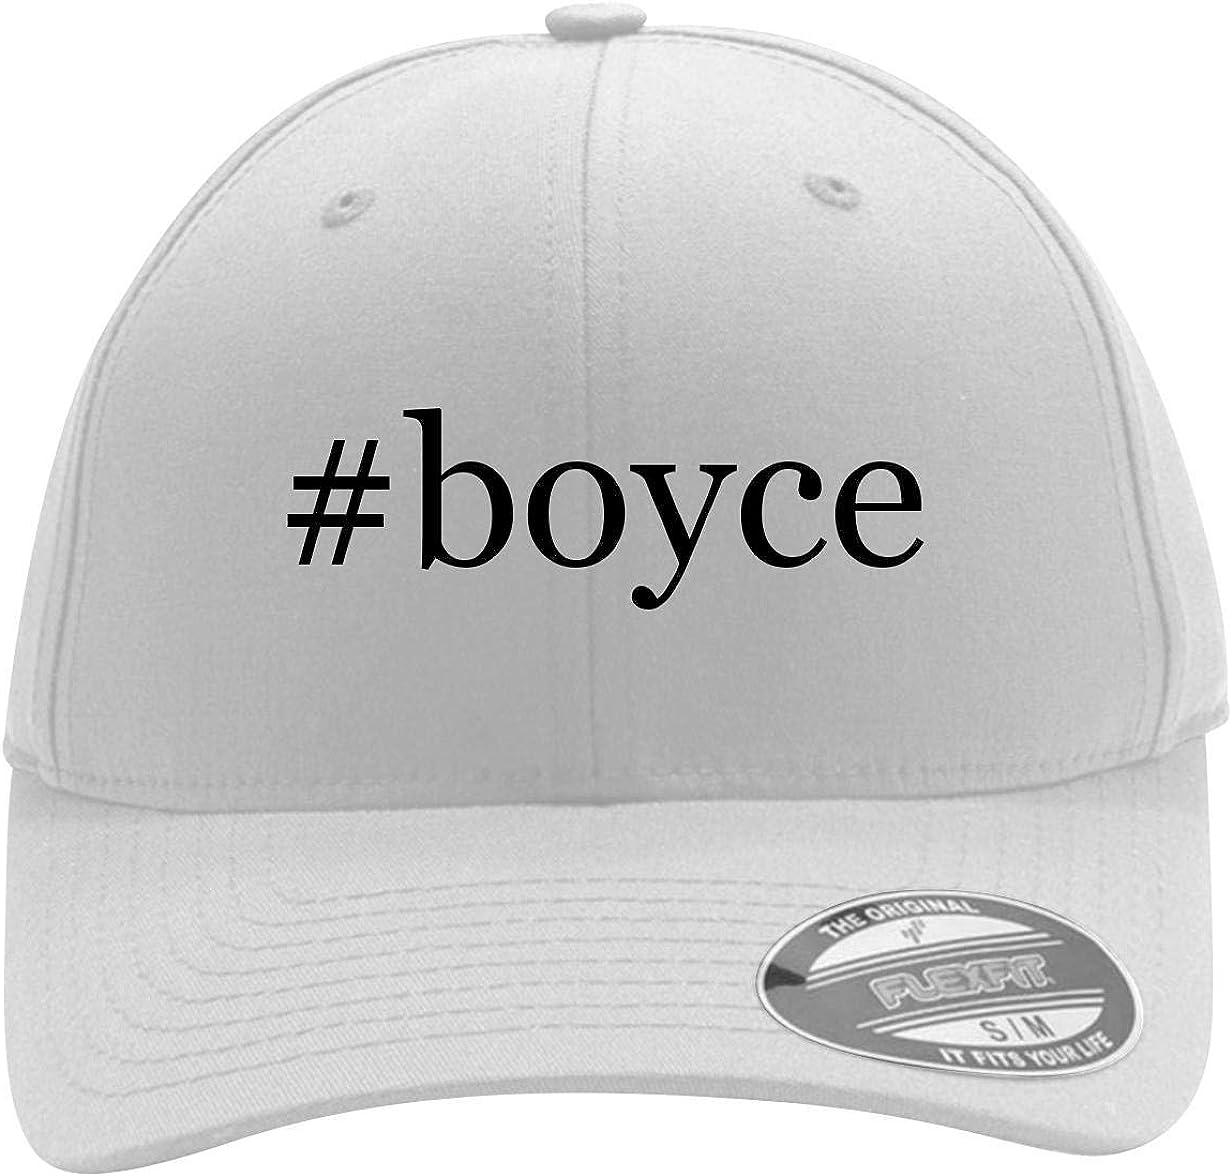 #Boyce - Men's Hashtag Flexfit Baseball Cap Hat 61RfMjCp2RL